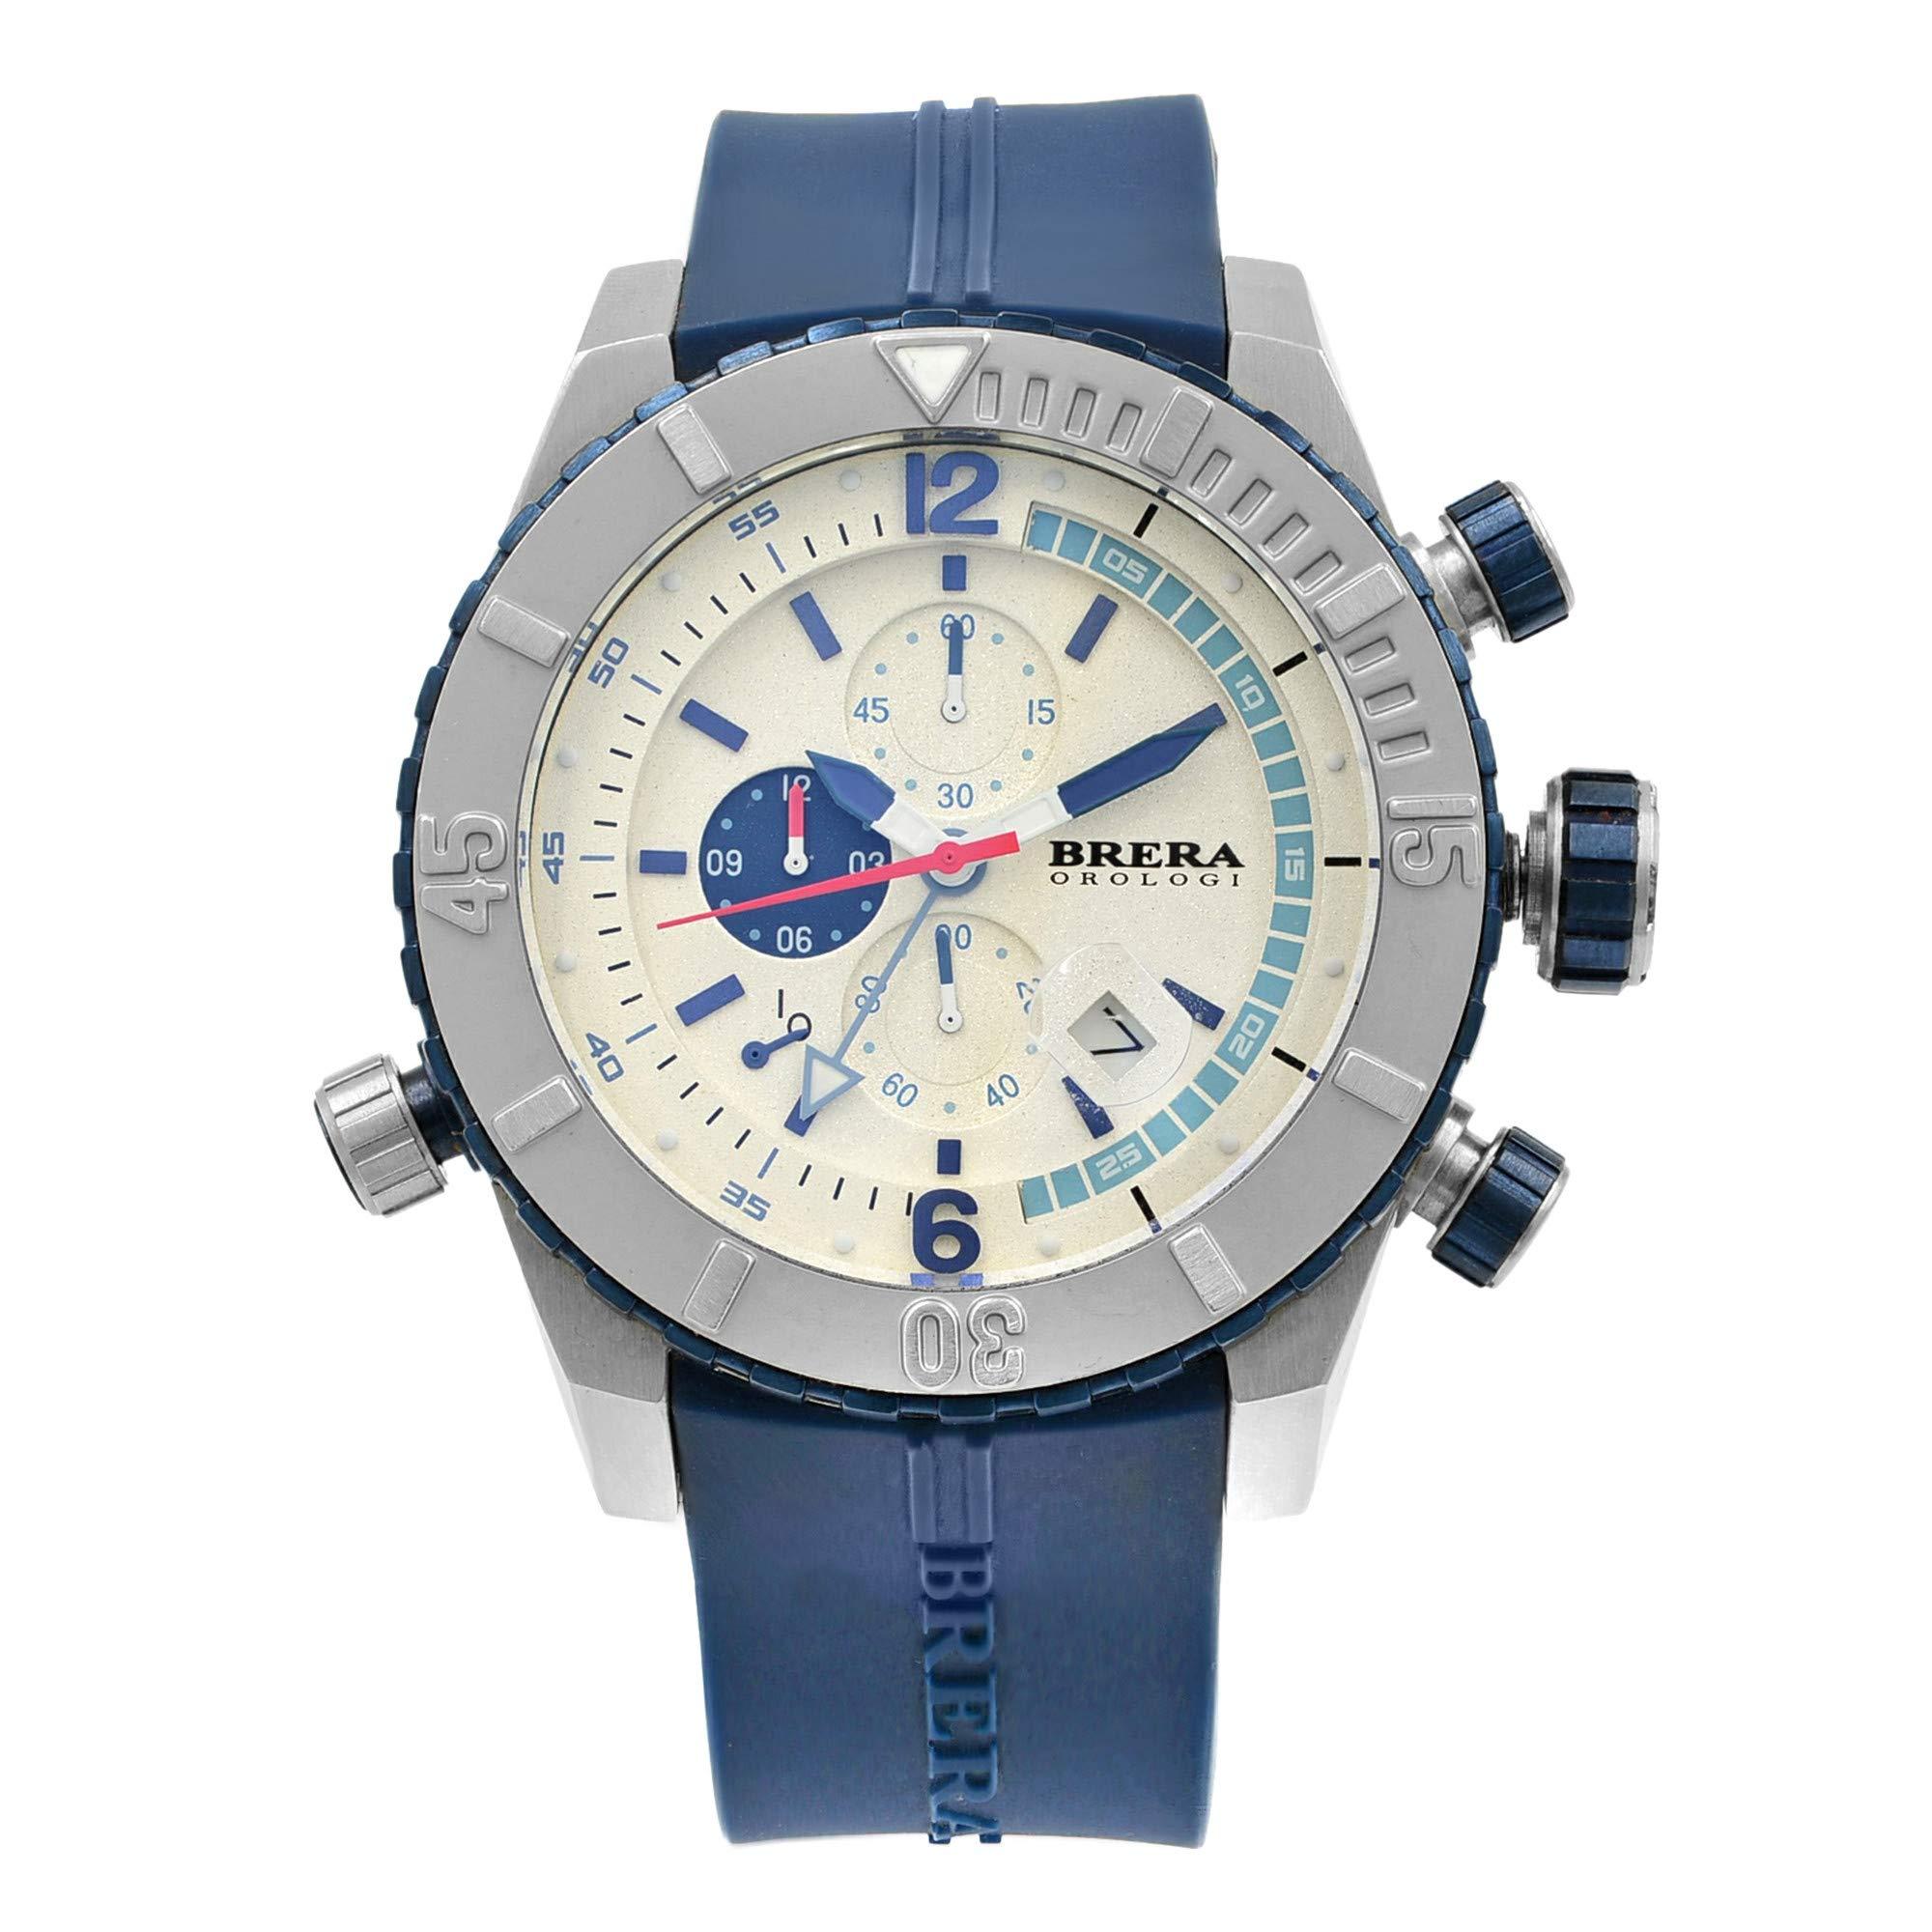 Brera Orologi Sottomarino Quartz Male Watch BRDVC4708 (Certified Pre-Owned)